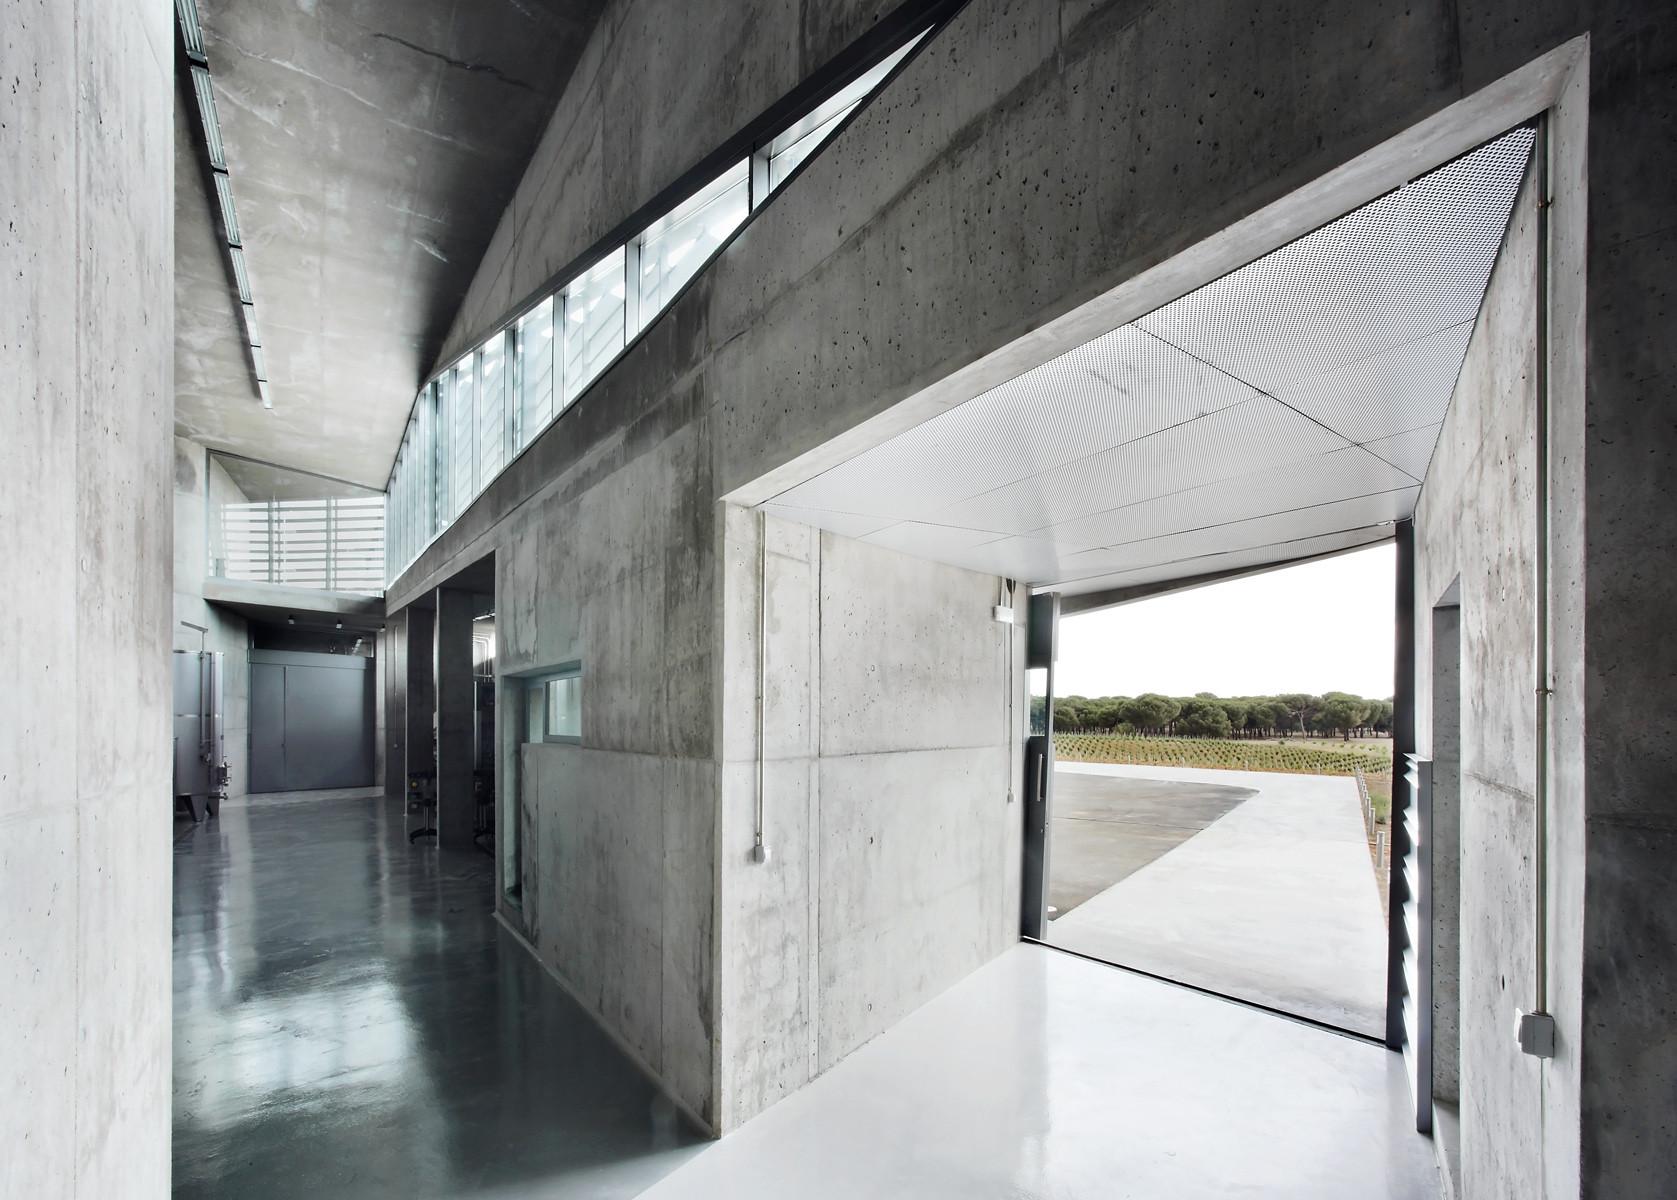 Bodega qumr n konkrit blu arquitectura plataforma - Fachada hormigon in situ ...